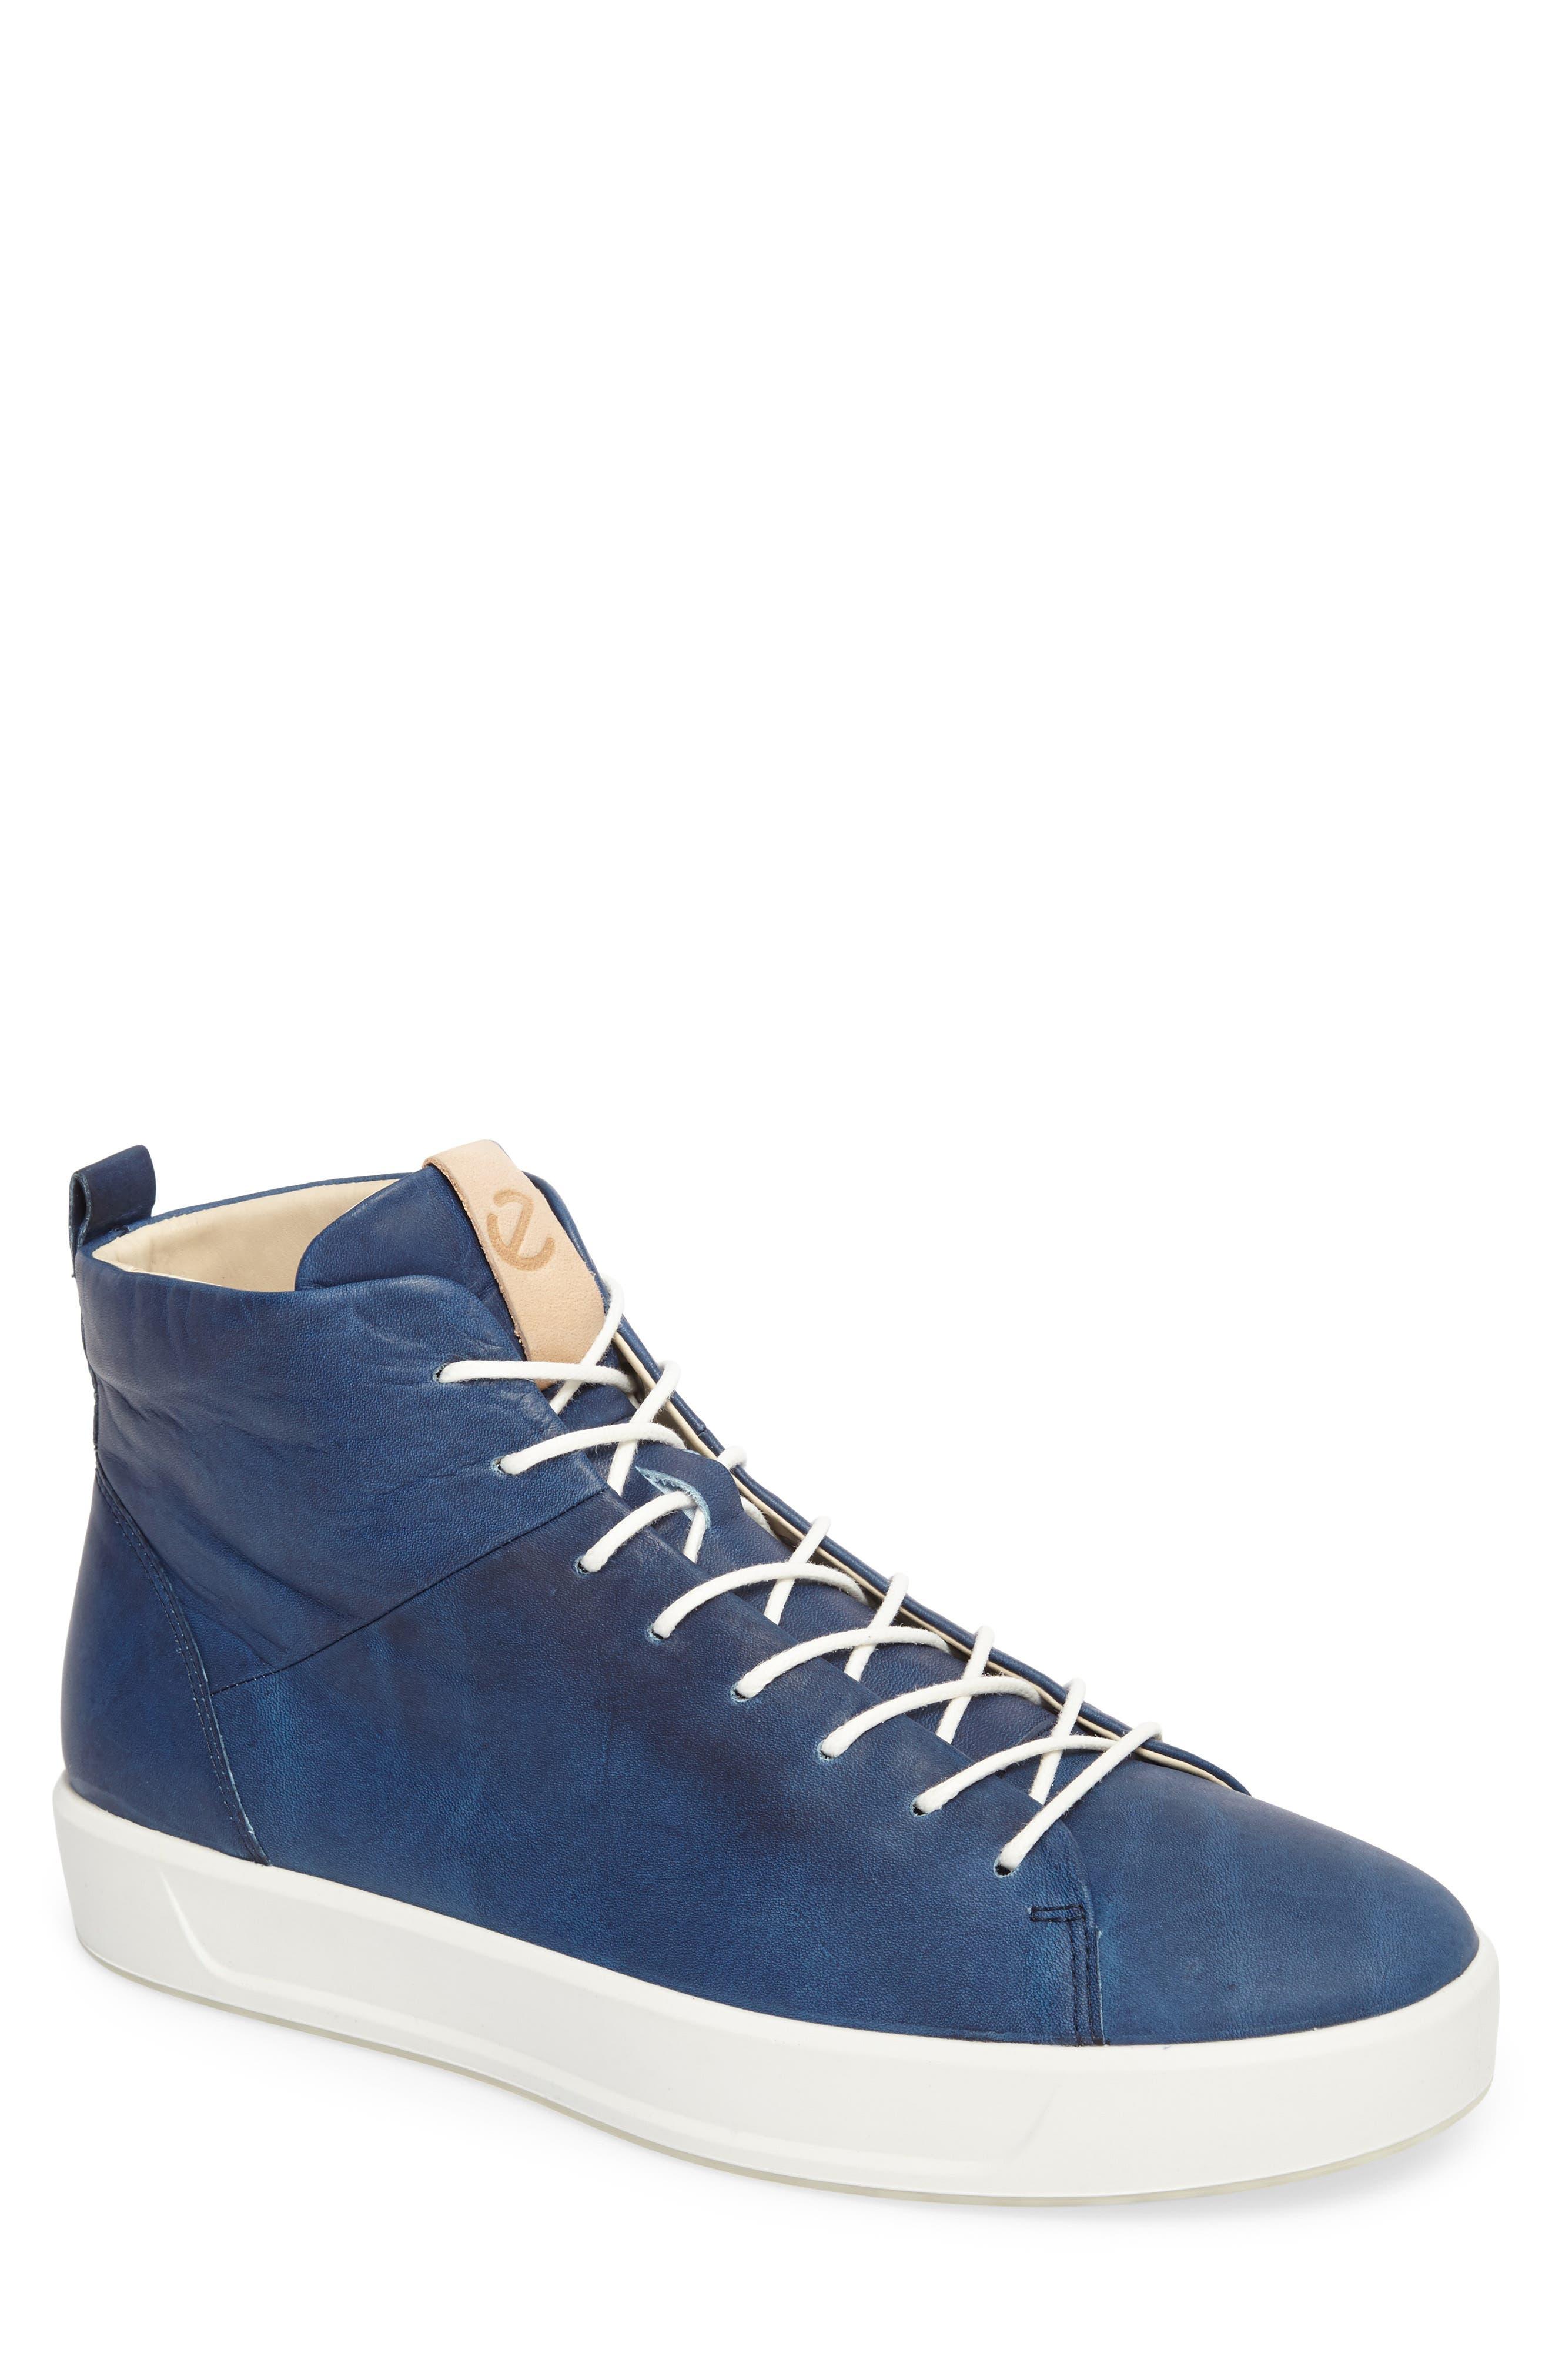 Soft 8 Sneaker,                             Main thumbnail 3, color,